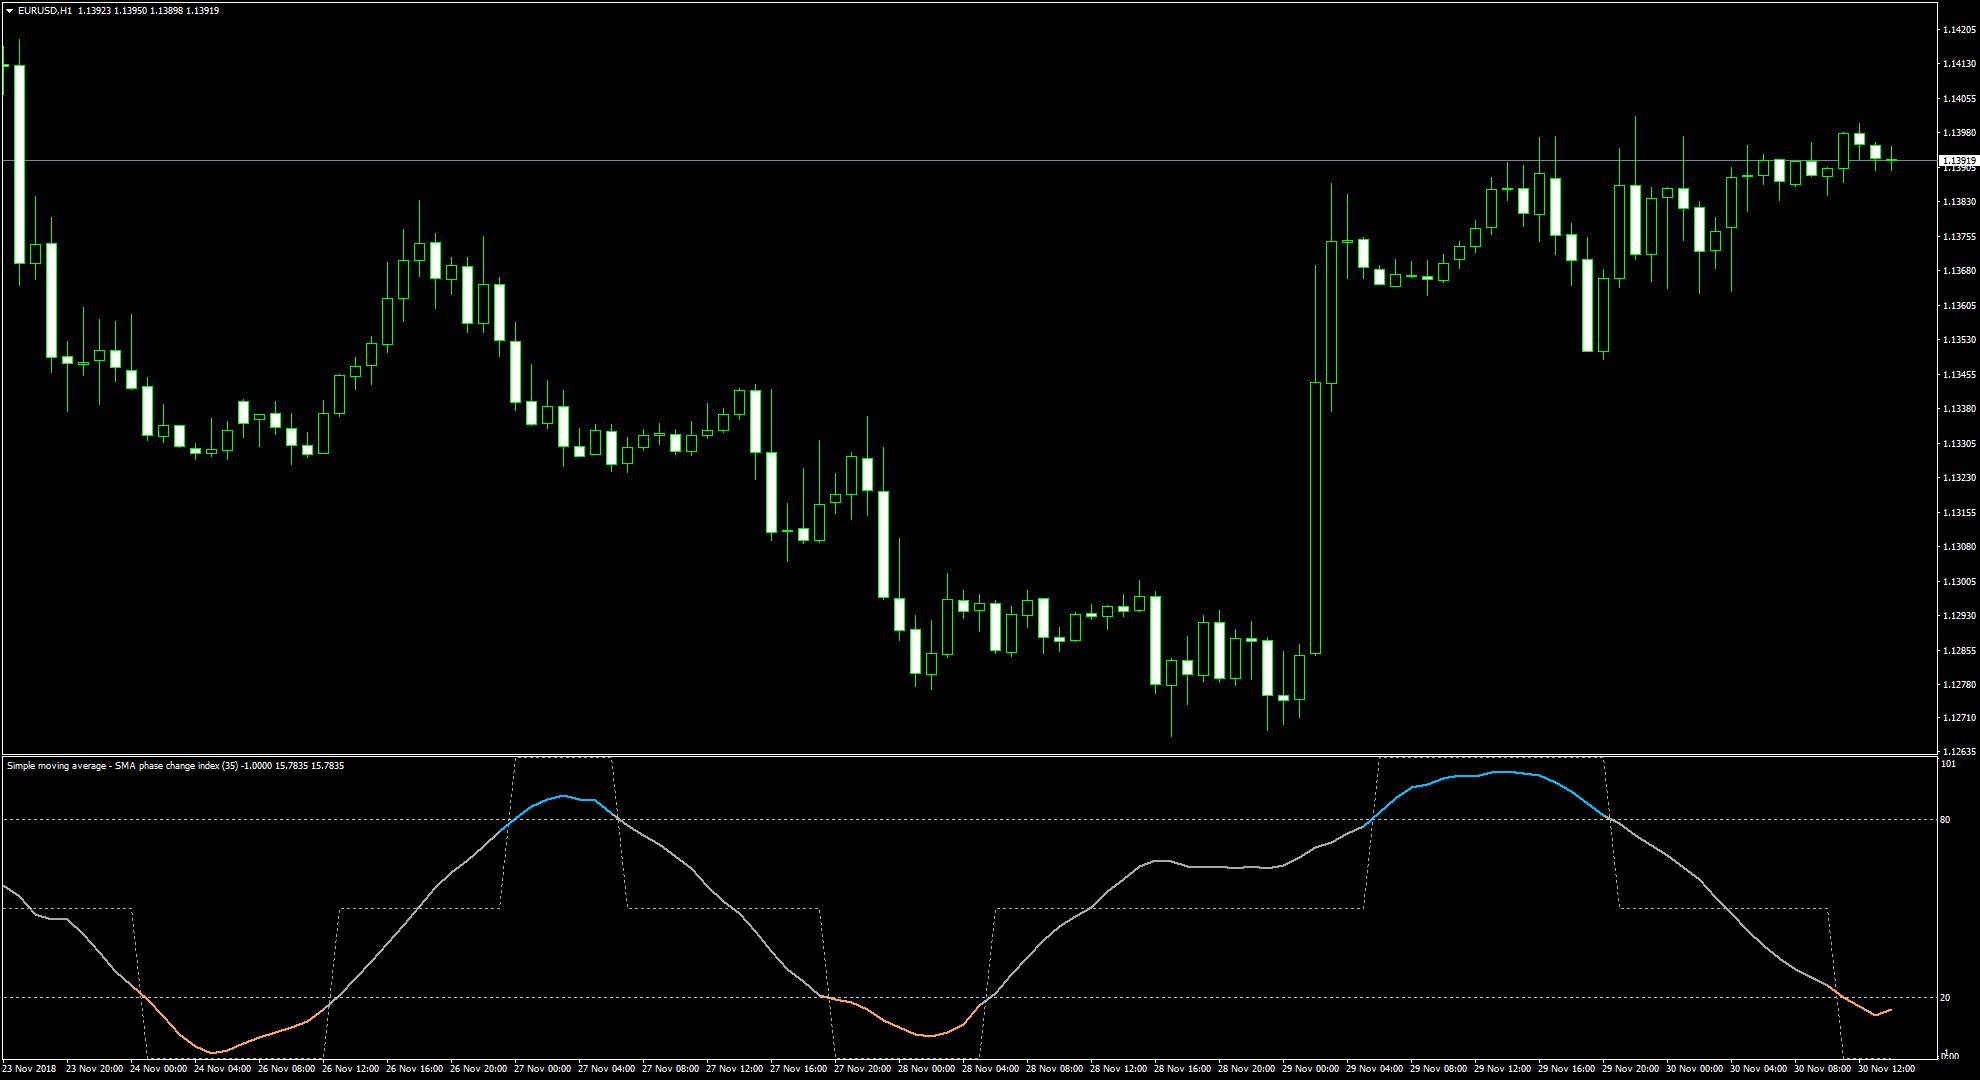 Phase_change_index_averages_smoothedトップ画像